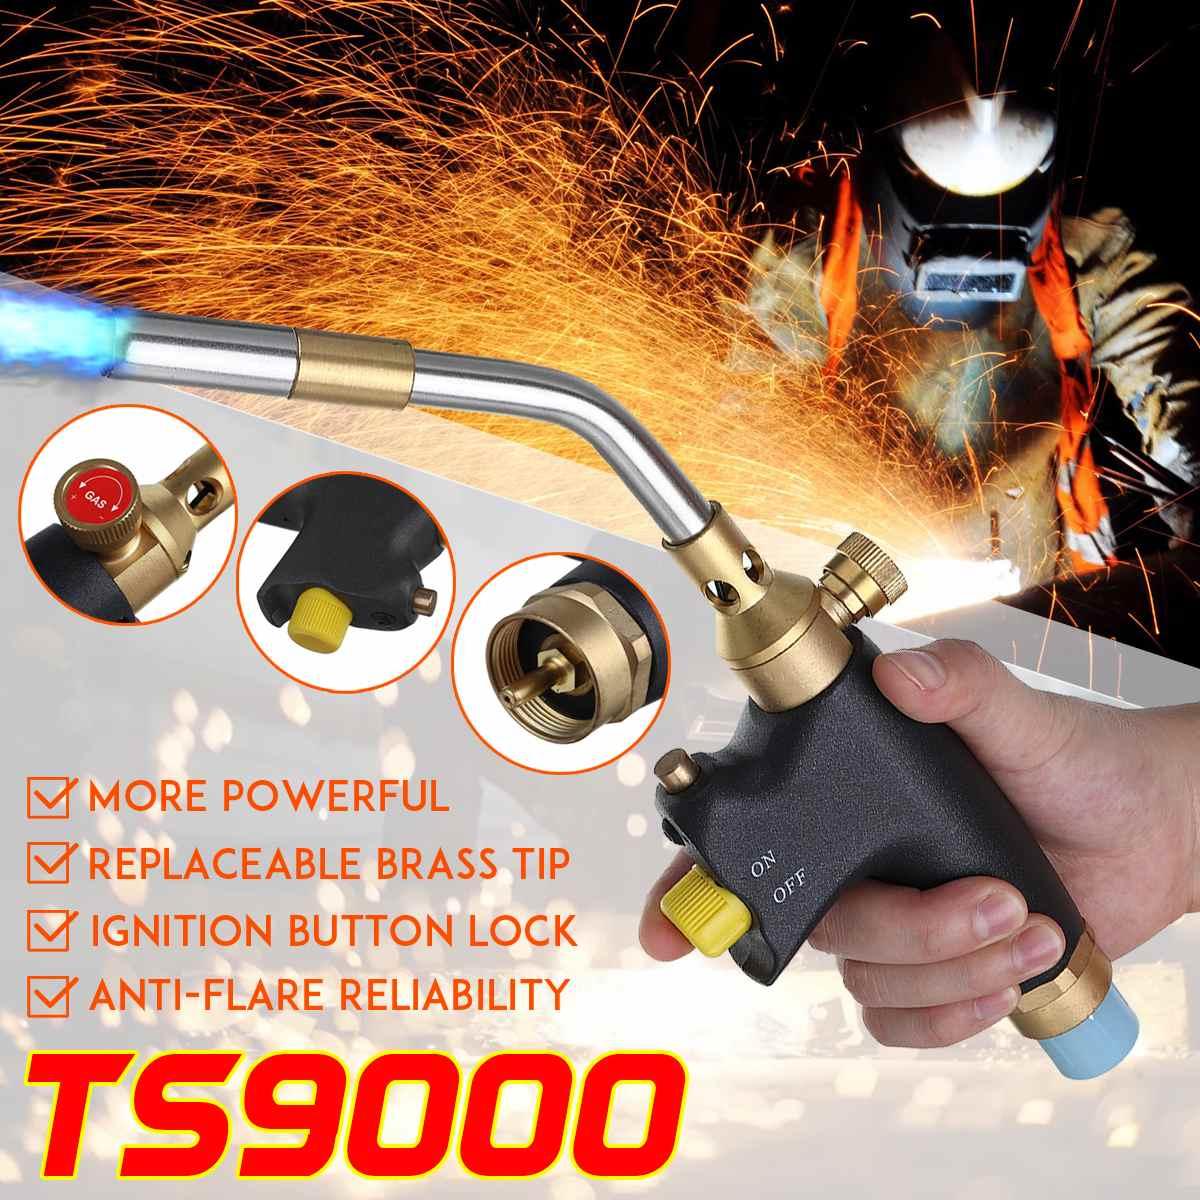 Braze Welding Torch MAPP Propane Gas Torch Piezo Trigger Ignition Copper Aluminum Heating Solder Burner TS9000